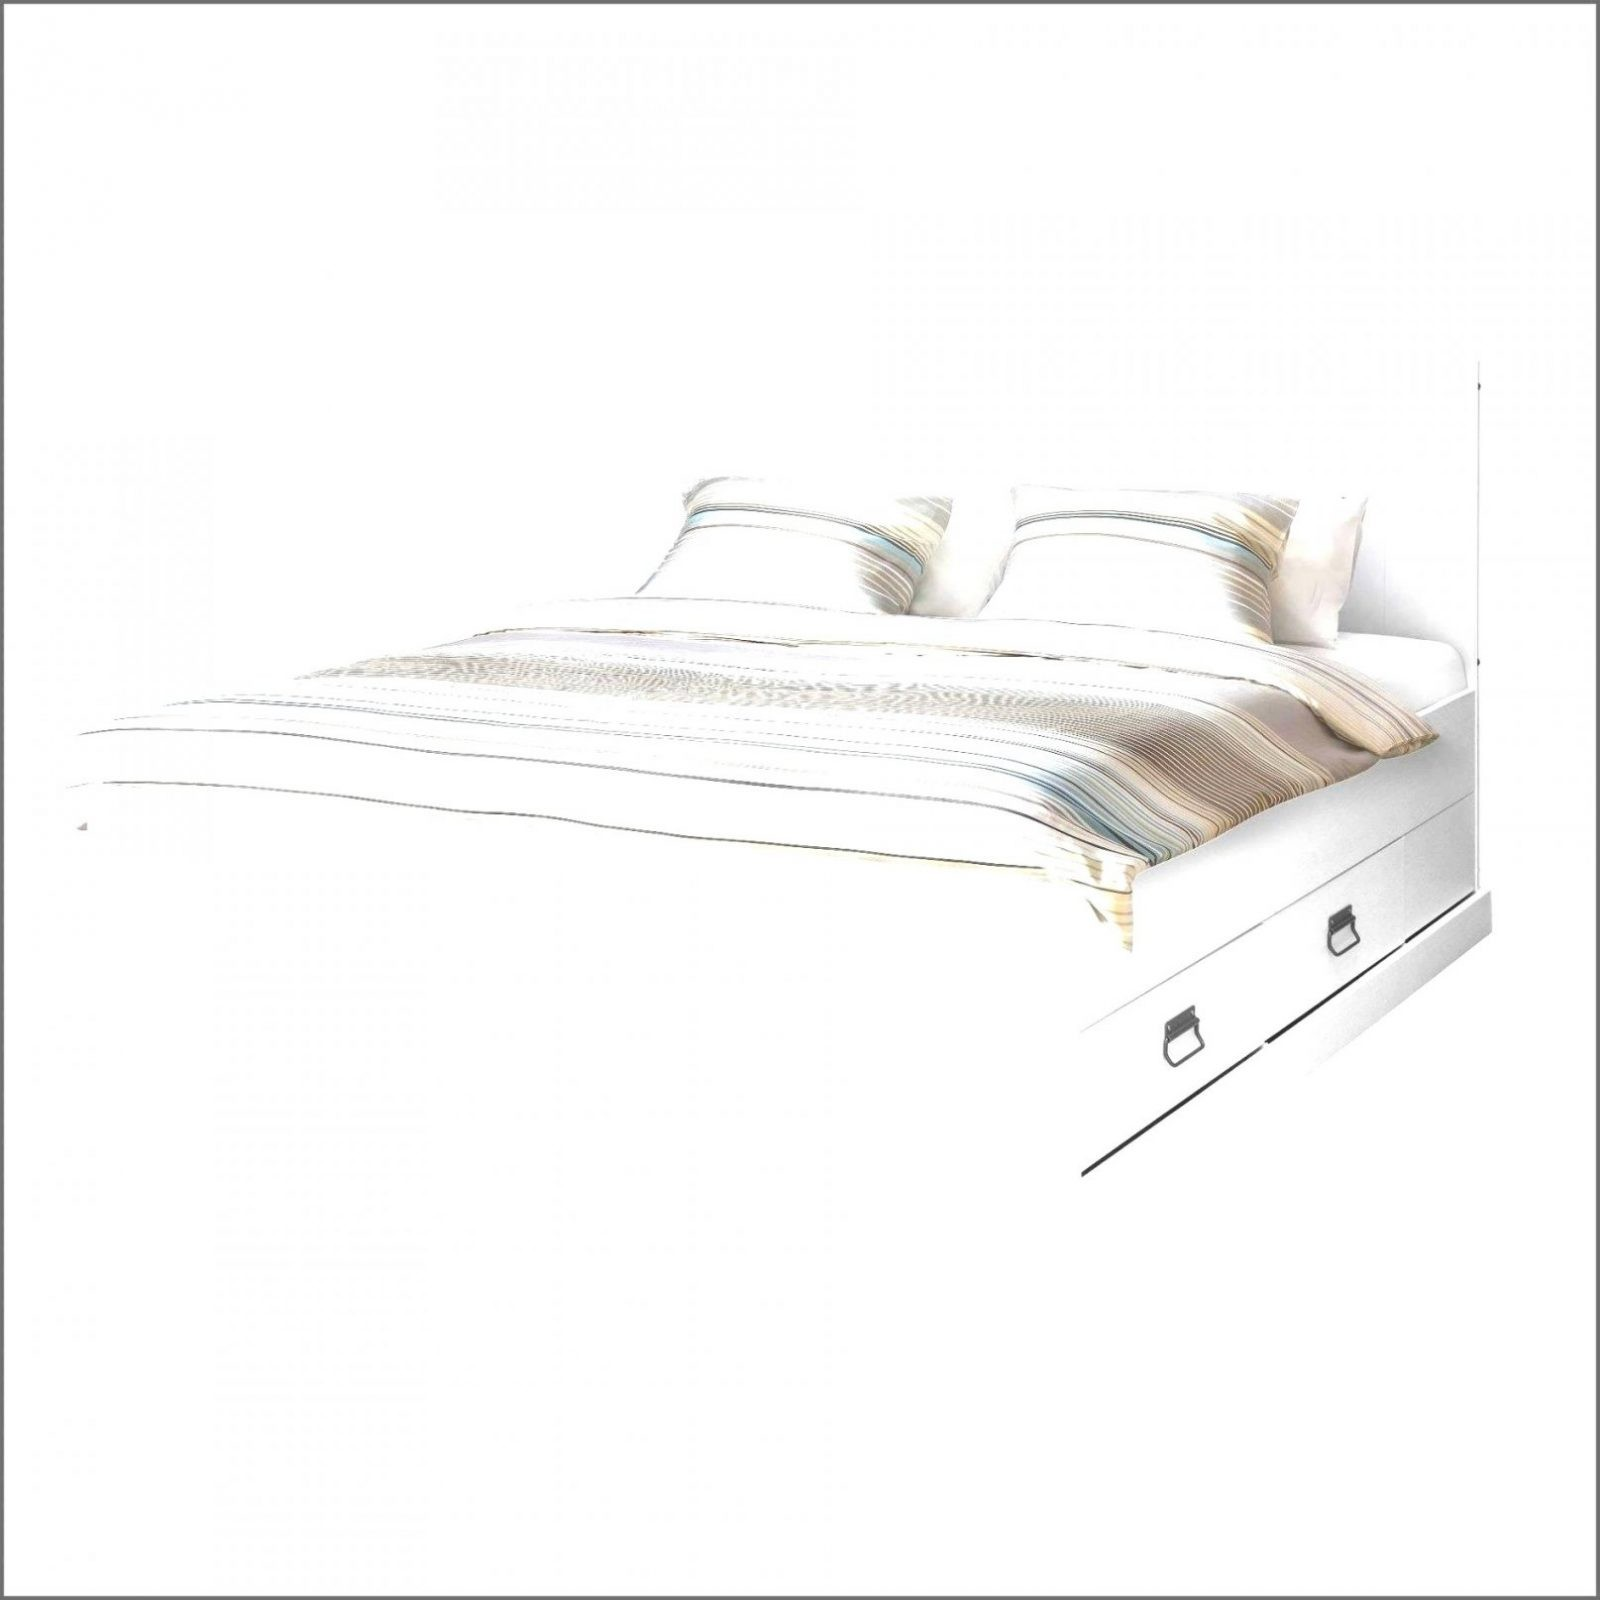 Bett Weiß Hochglanz Genial 36 Genial Bett Mit Schubladen 90×200 Weiß von Ikea Bett Weiß Mit Schubladen Bild